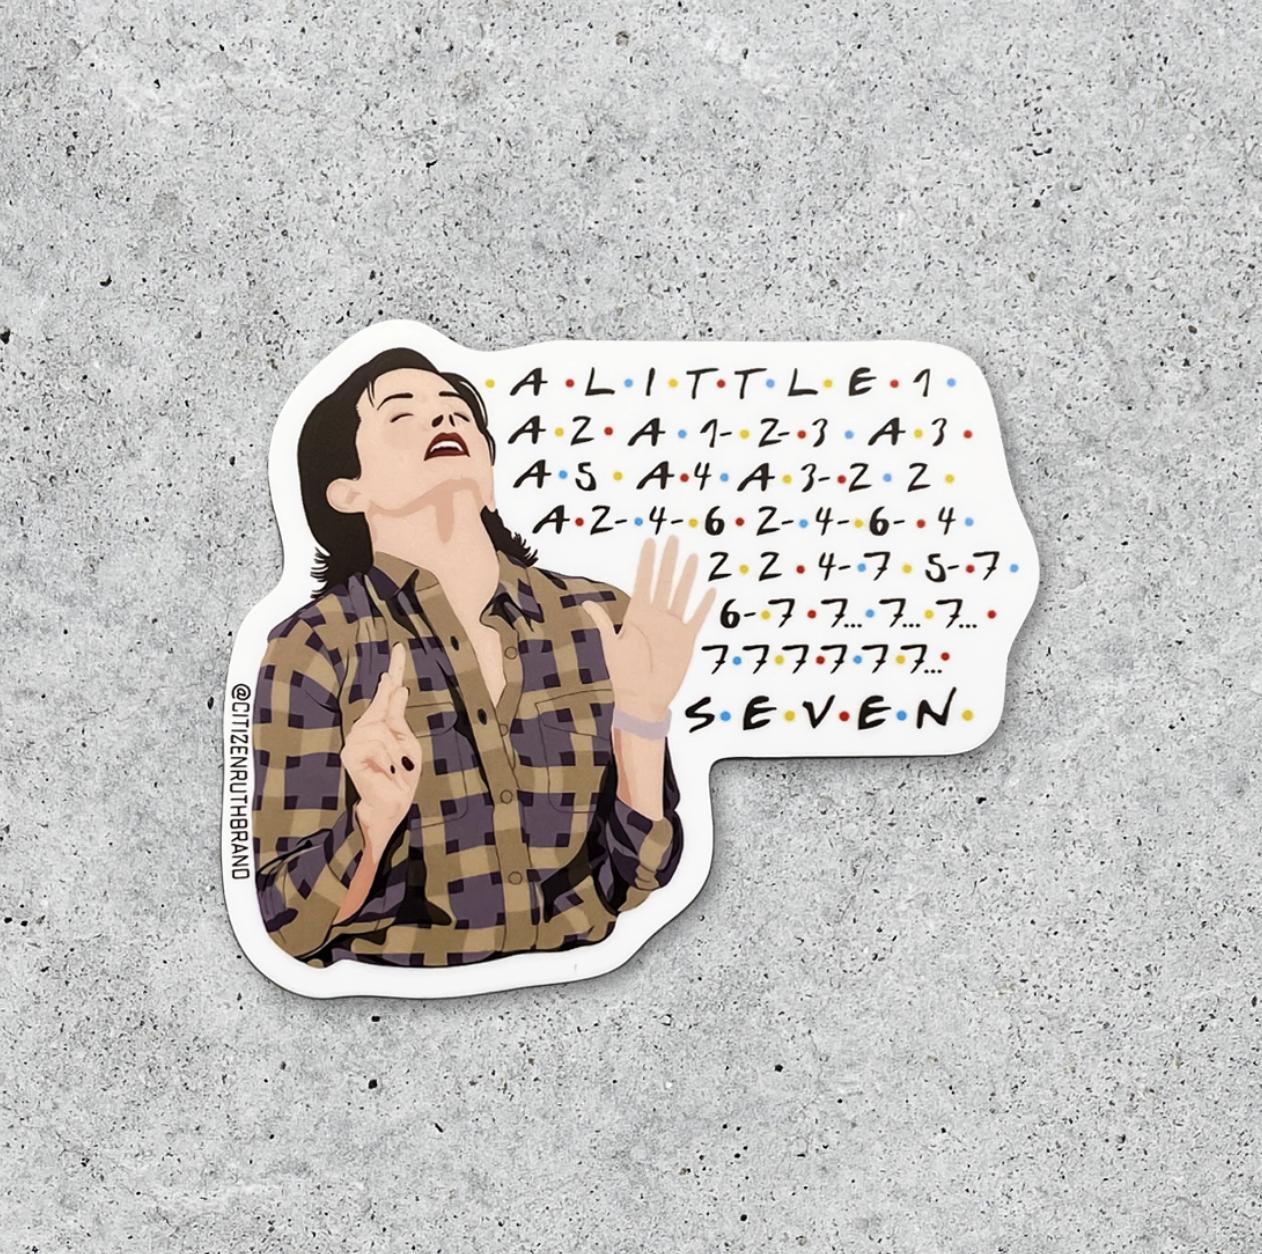 Citizen Ruth Friends 7 Erogenous Zones Sticker